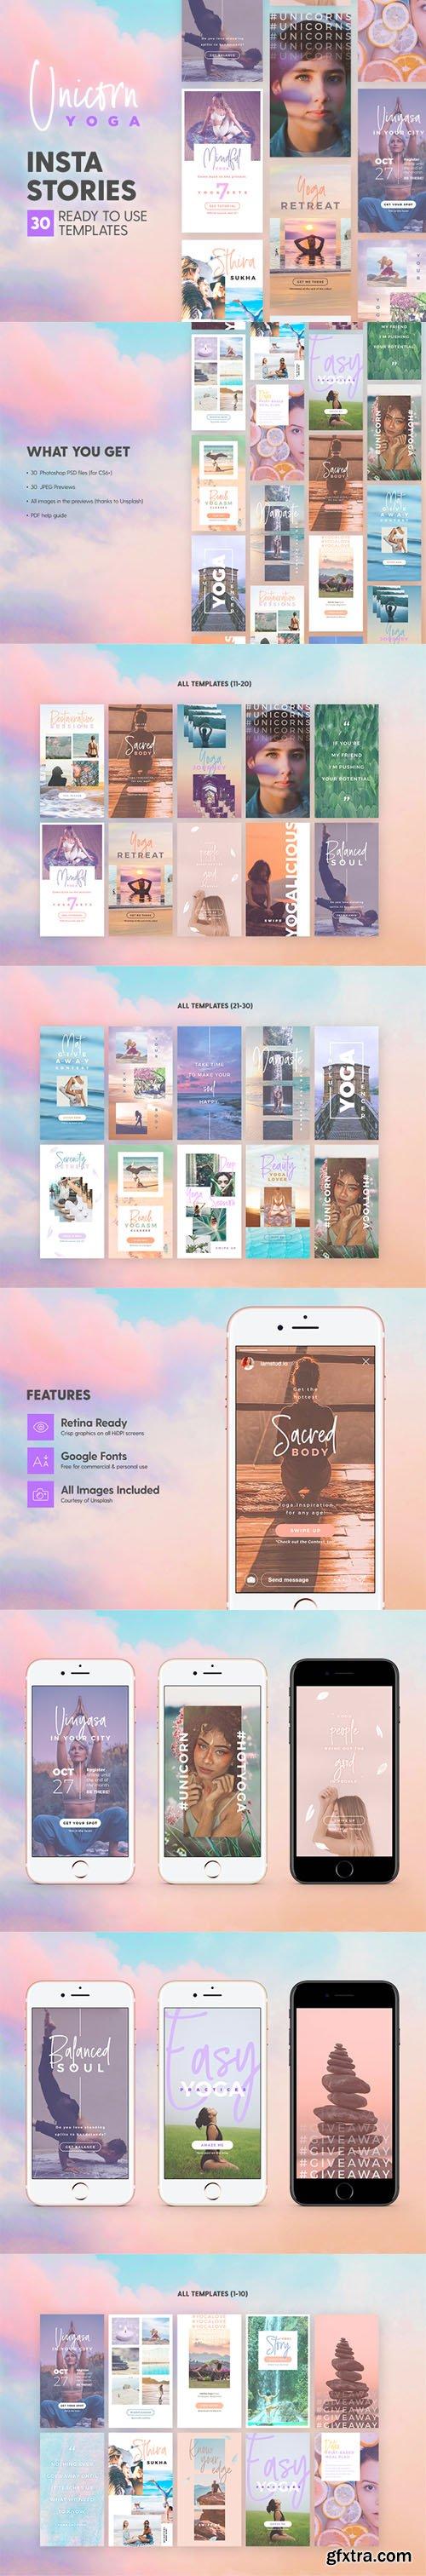 Unicorn Yoga Insta Stories - 30 Photoshop Templates for Modern Instagram Stories